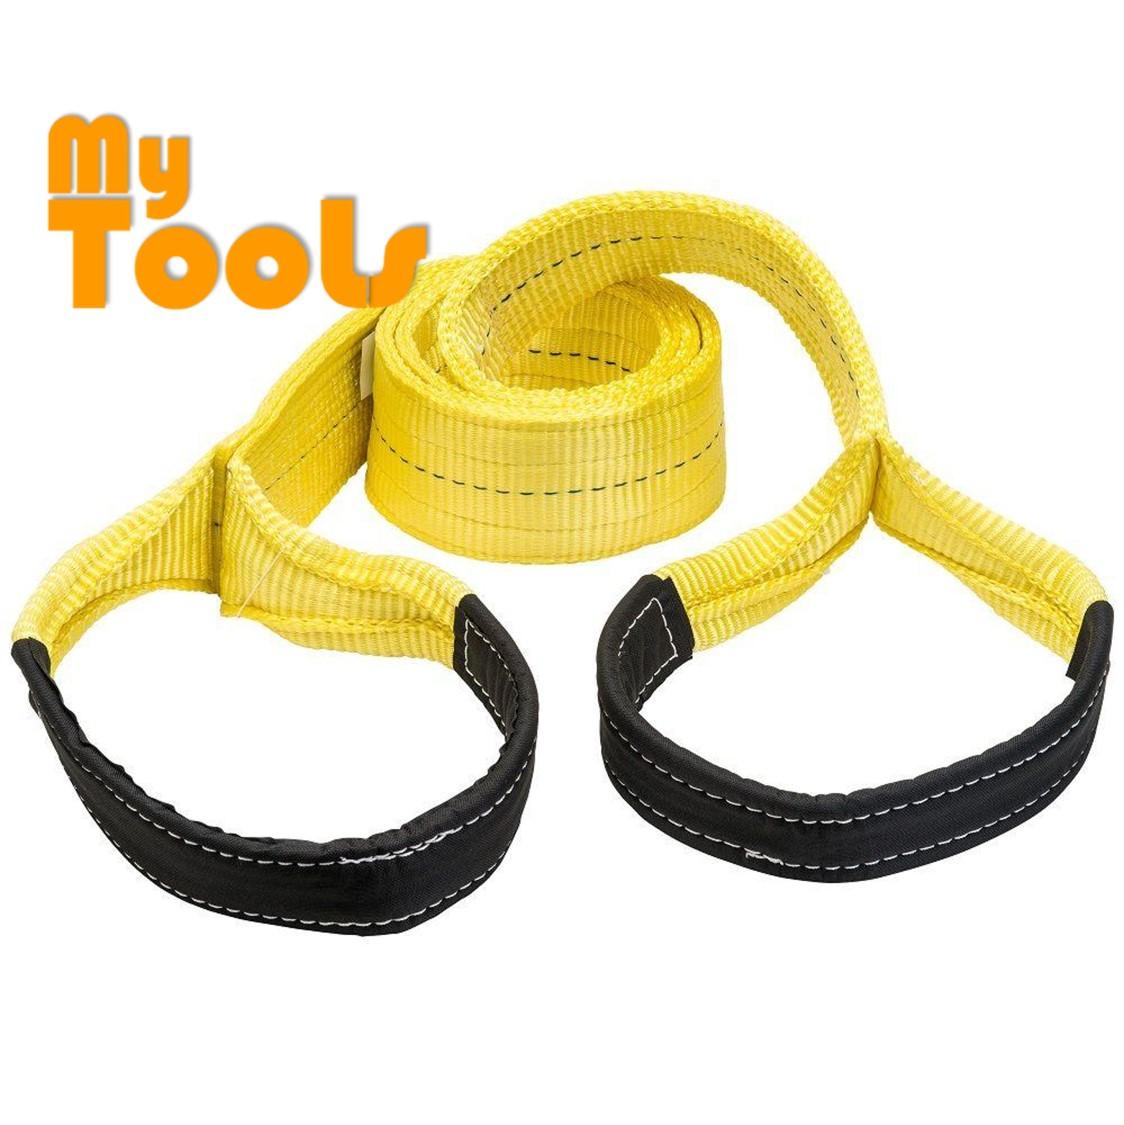 Yellow 3Ton 75mm x 3m Flat Webbing Sling Eye and Eye Lifting Strap Belt ( Safety Factor 6:1)